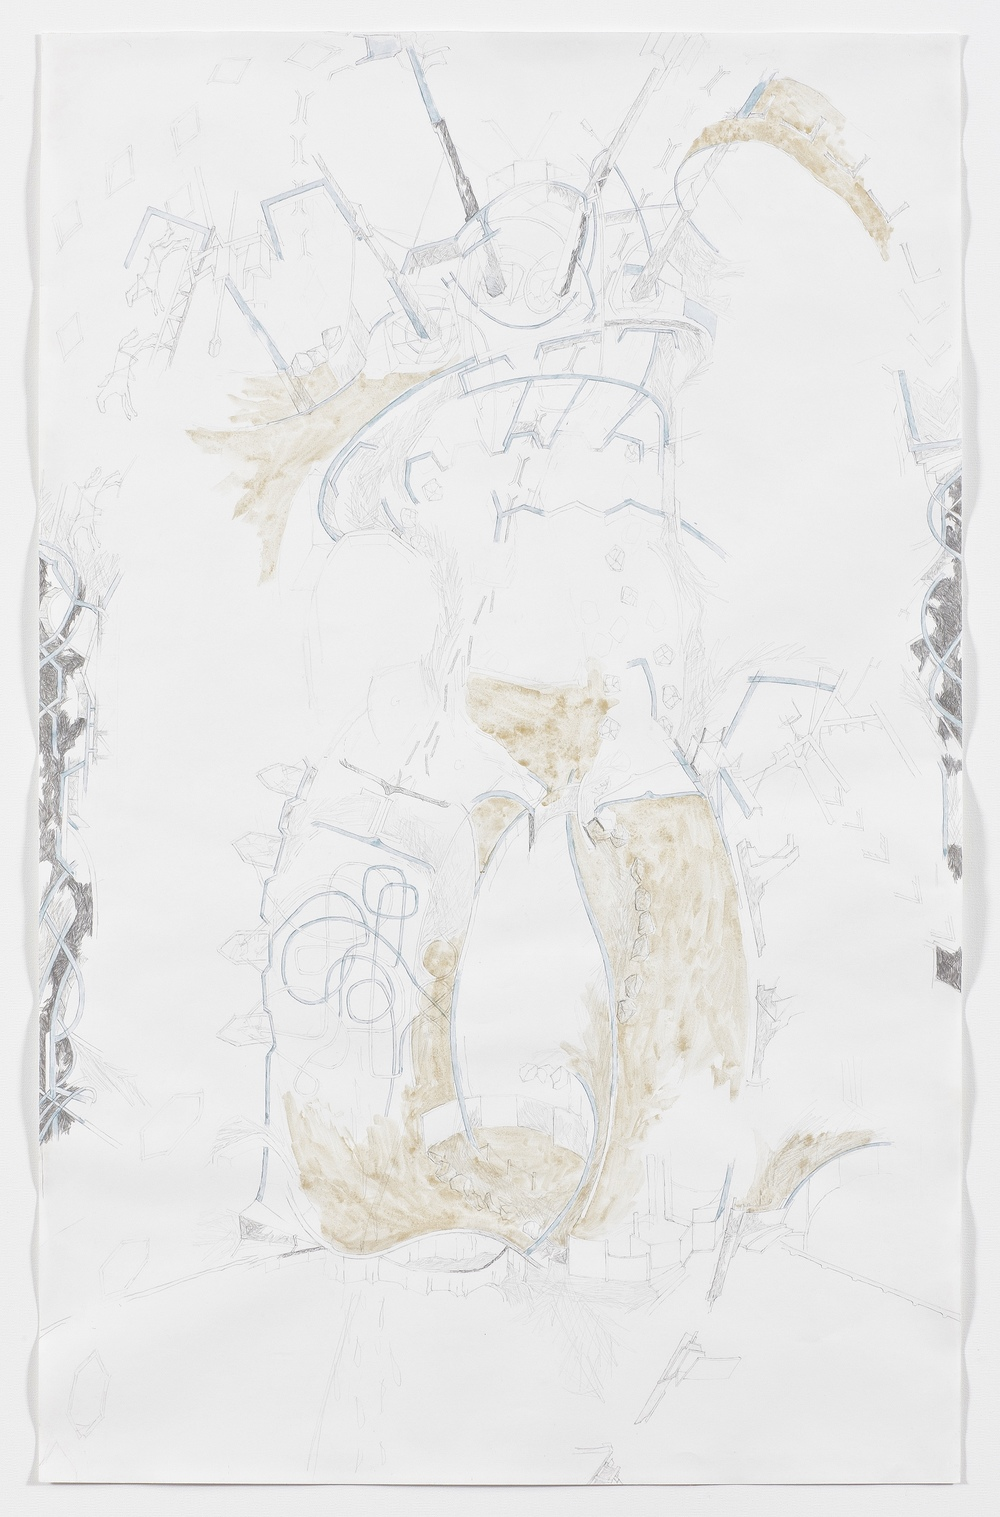 JB-20120322-Gudmundsdottir-Repro-Zeichnung-026 Kopie.jpg